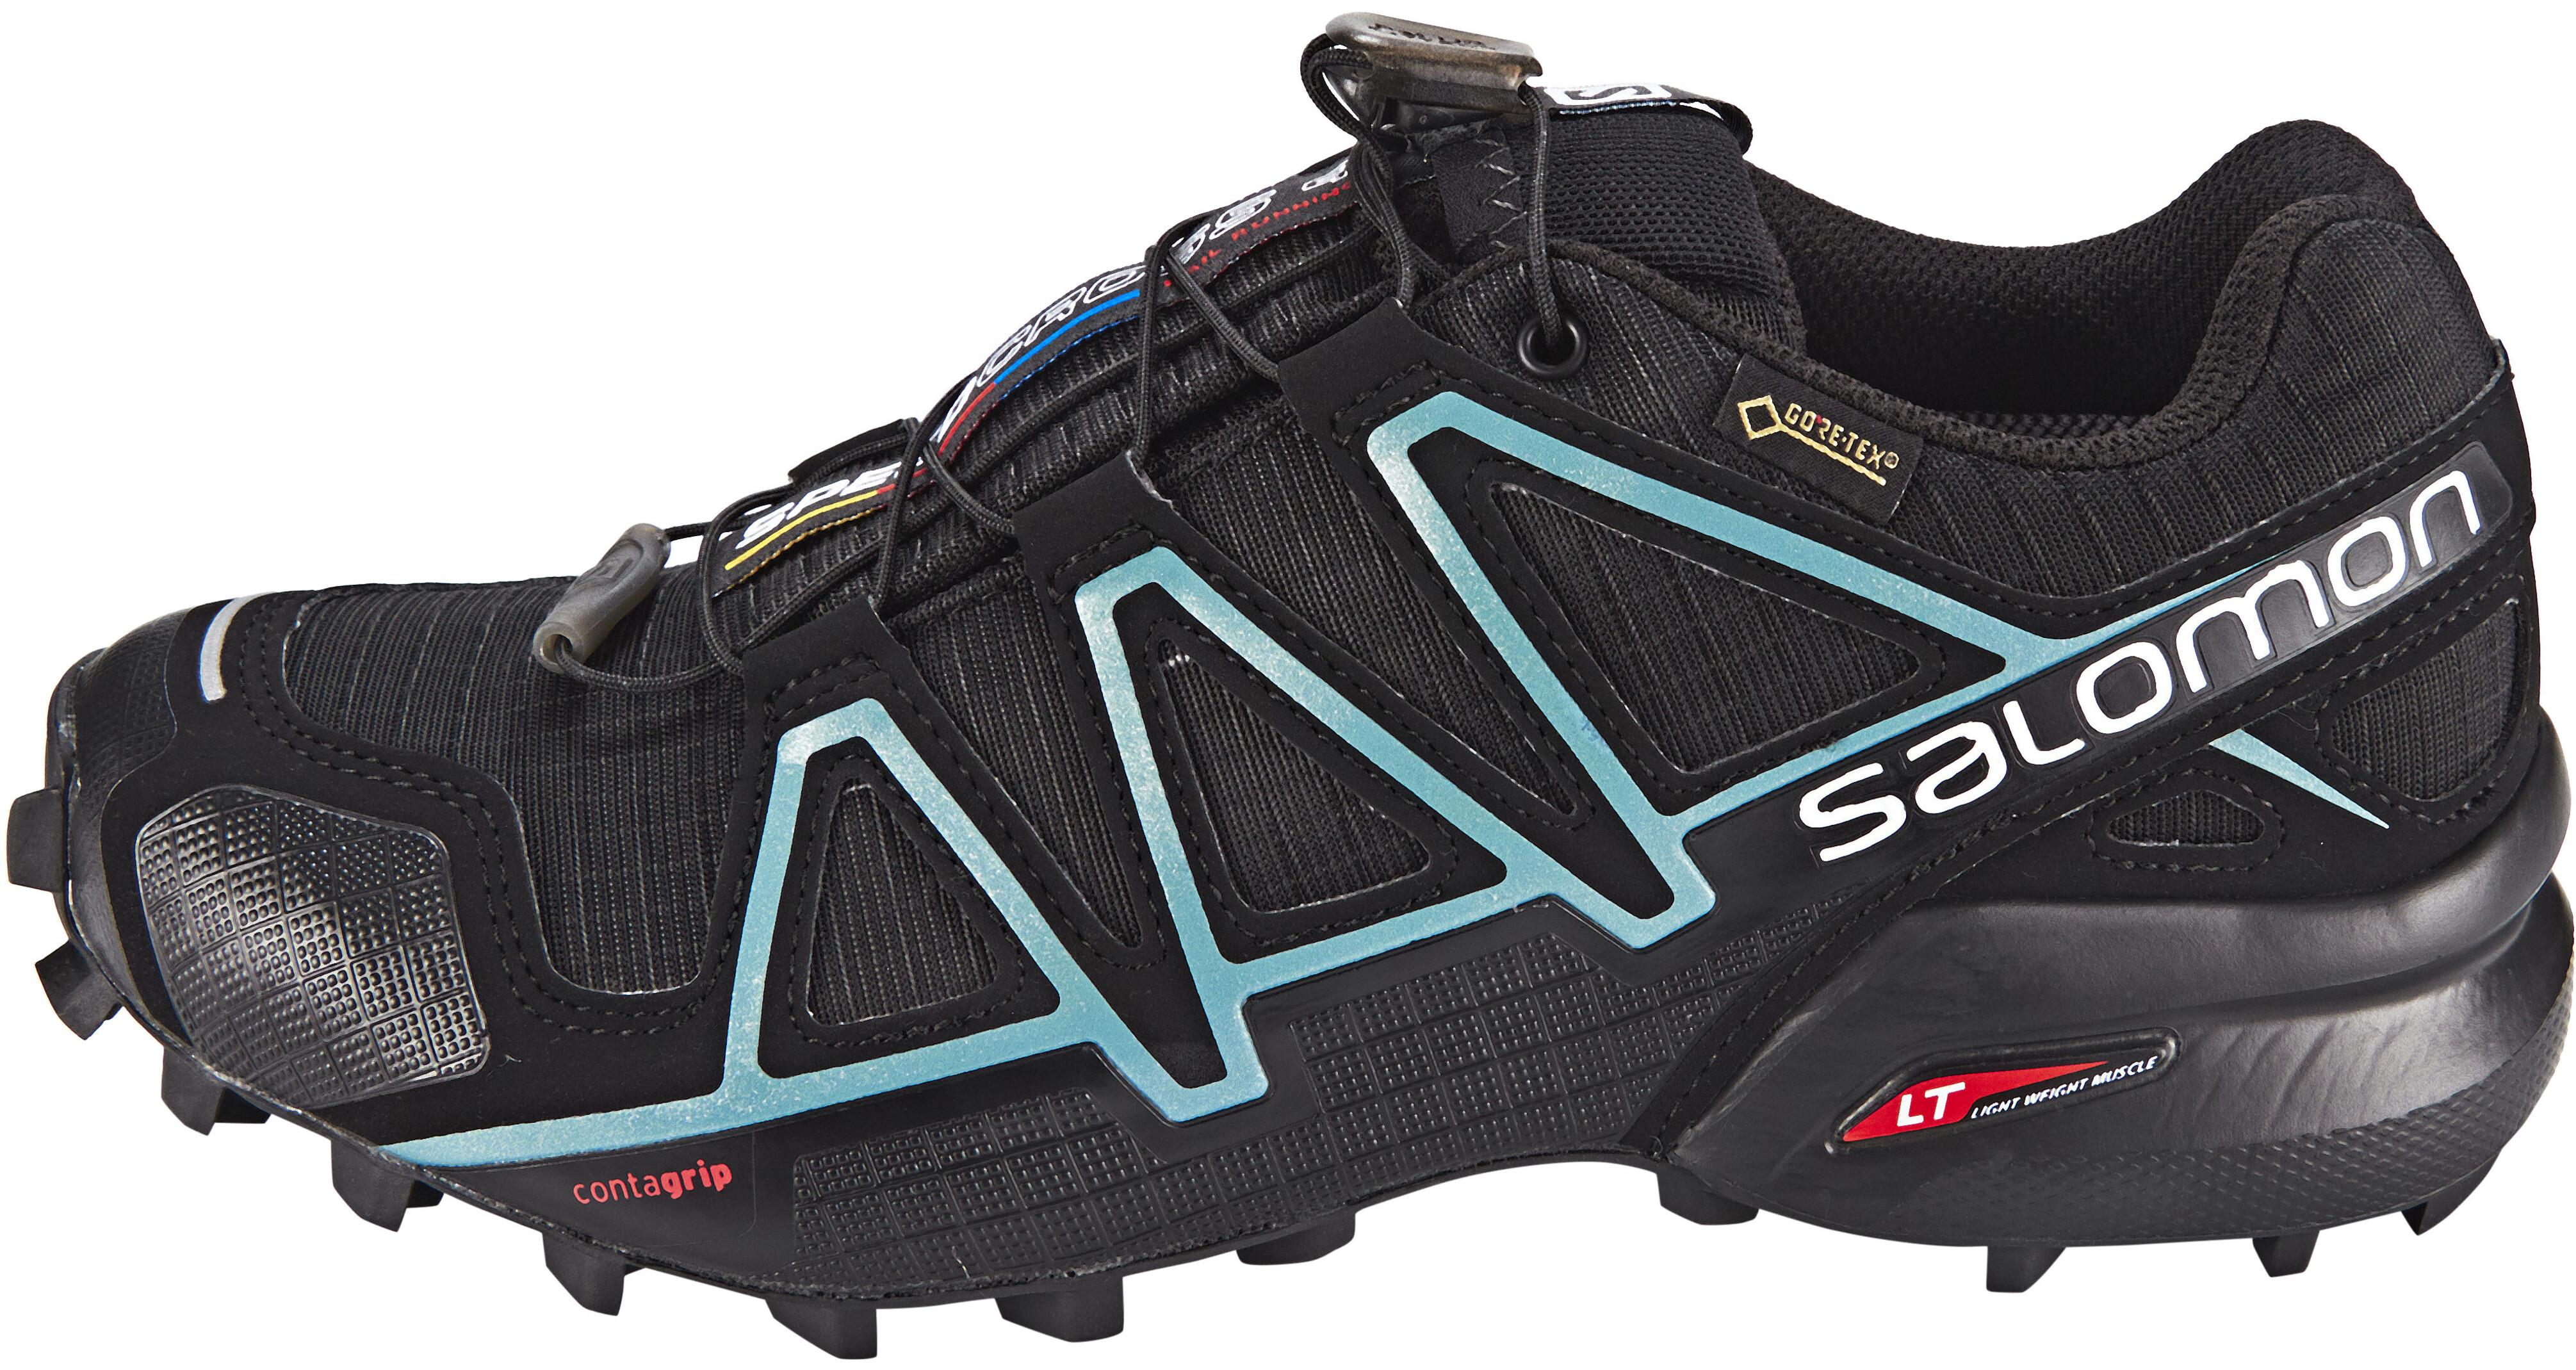 88815768262 Salomon Speedcross 4 GTX Hardloopschoenen Dames, black/black/metallic  bubble blue